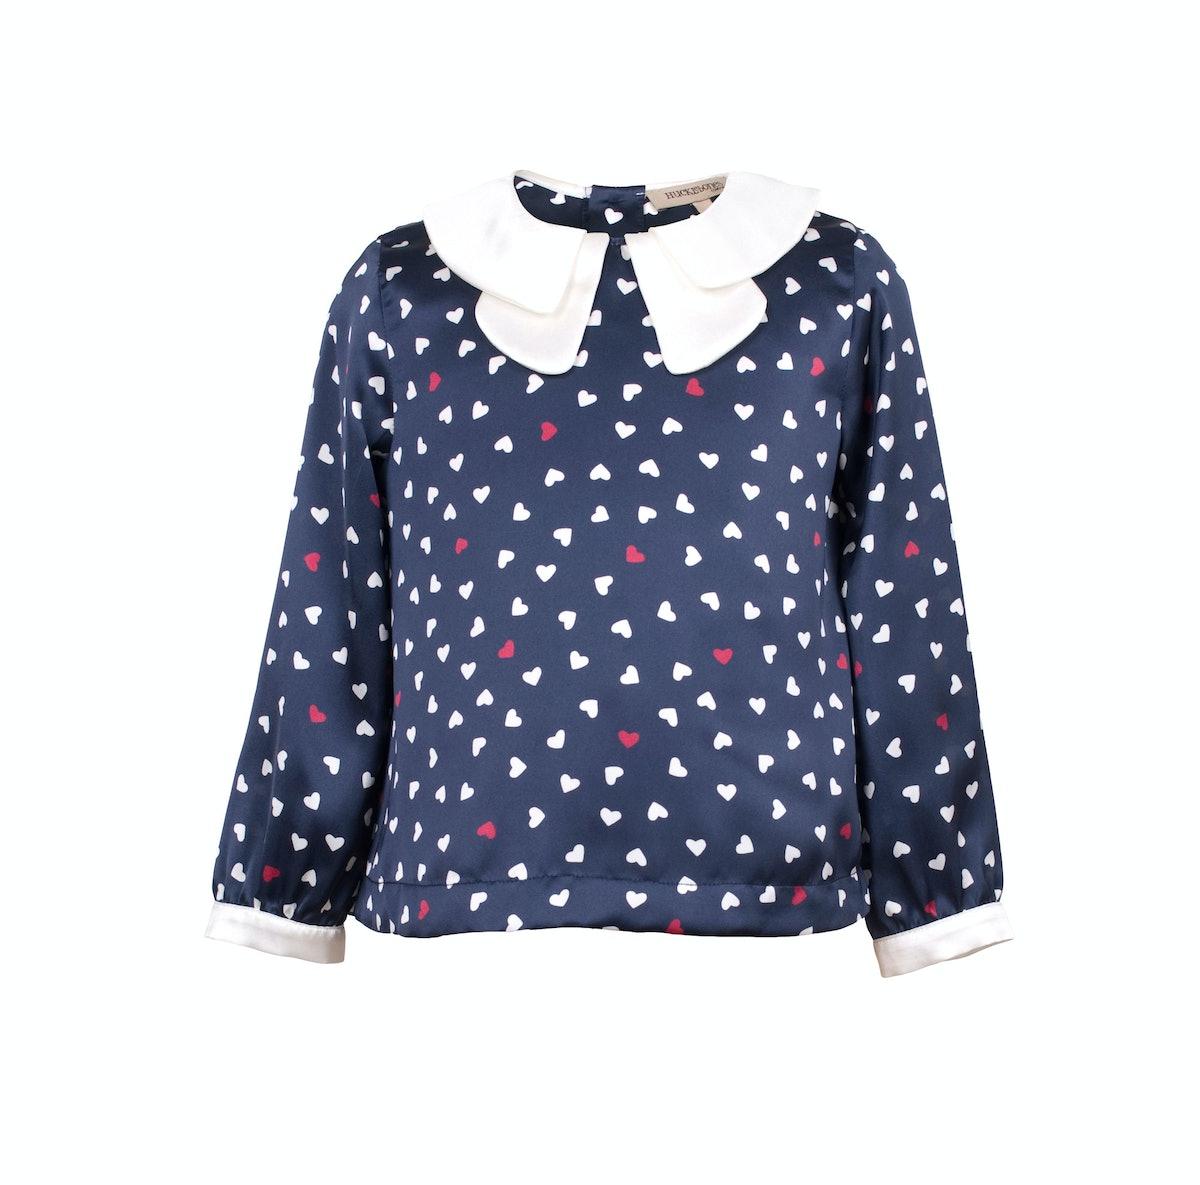 Hucklebones blouse, $124, [alexandalexa.com](http://rstyle.me/n/dzavk3w3n).